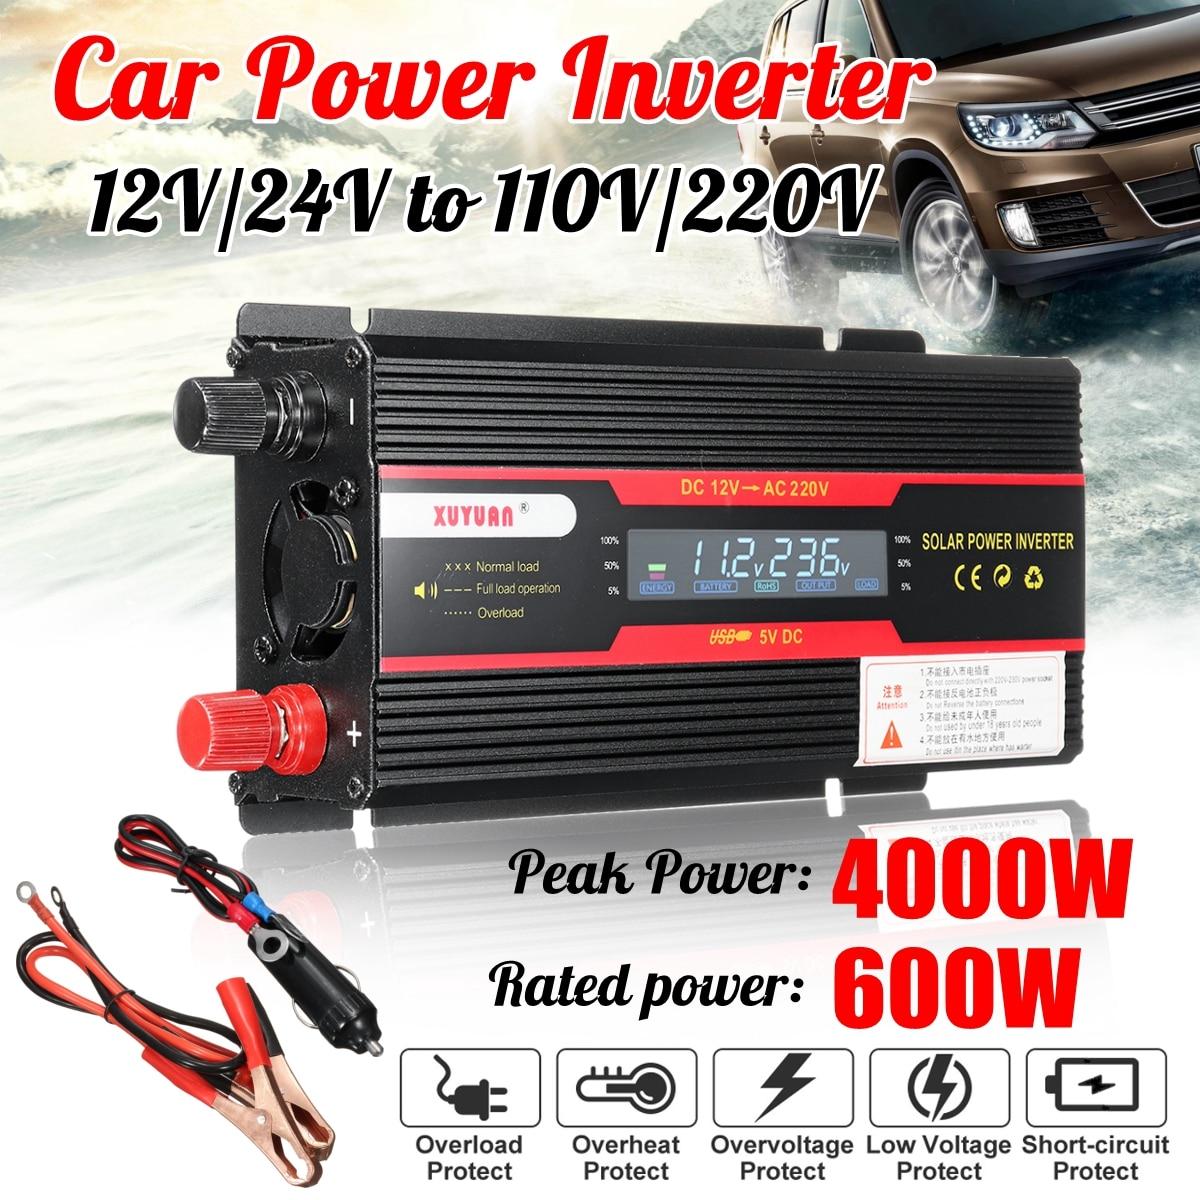 Car Inverter 12V 220V 4000W P eak Power Inverter Voltage Convertor Transformer DC 12V/24V To AC 220V/110V Solar Inversor 1pcs lot sh b17 50w 220v to 110v 110v to 220v